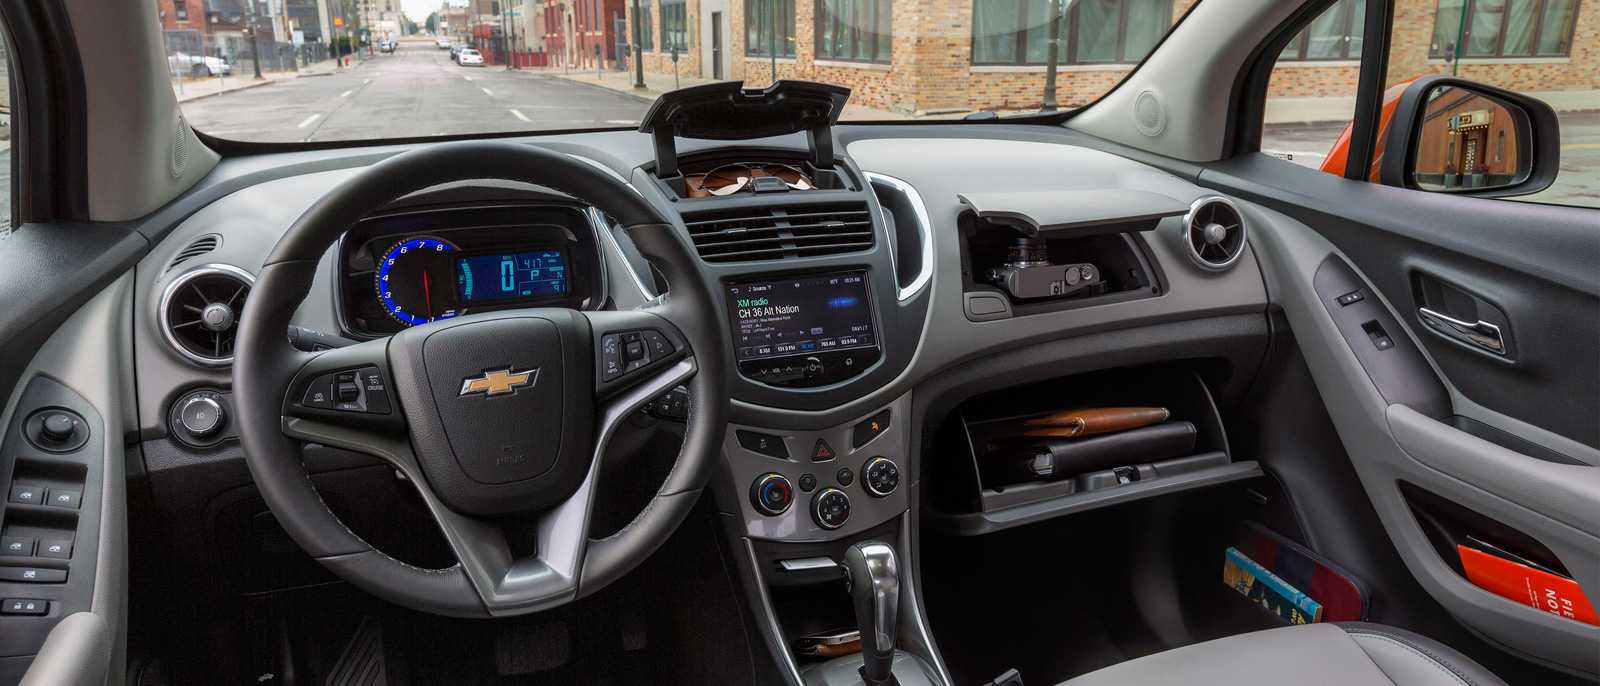 2016 Chevy Trax Interior Cabin